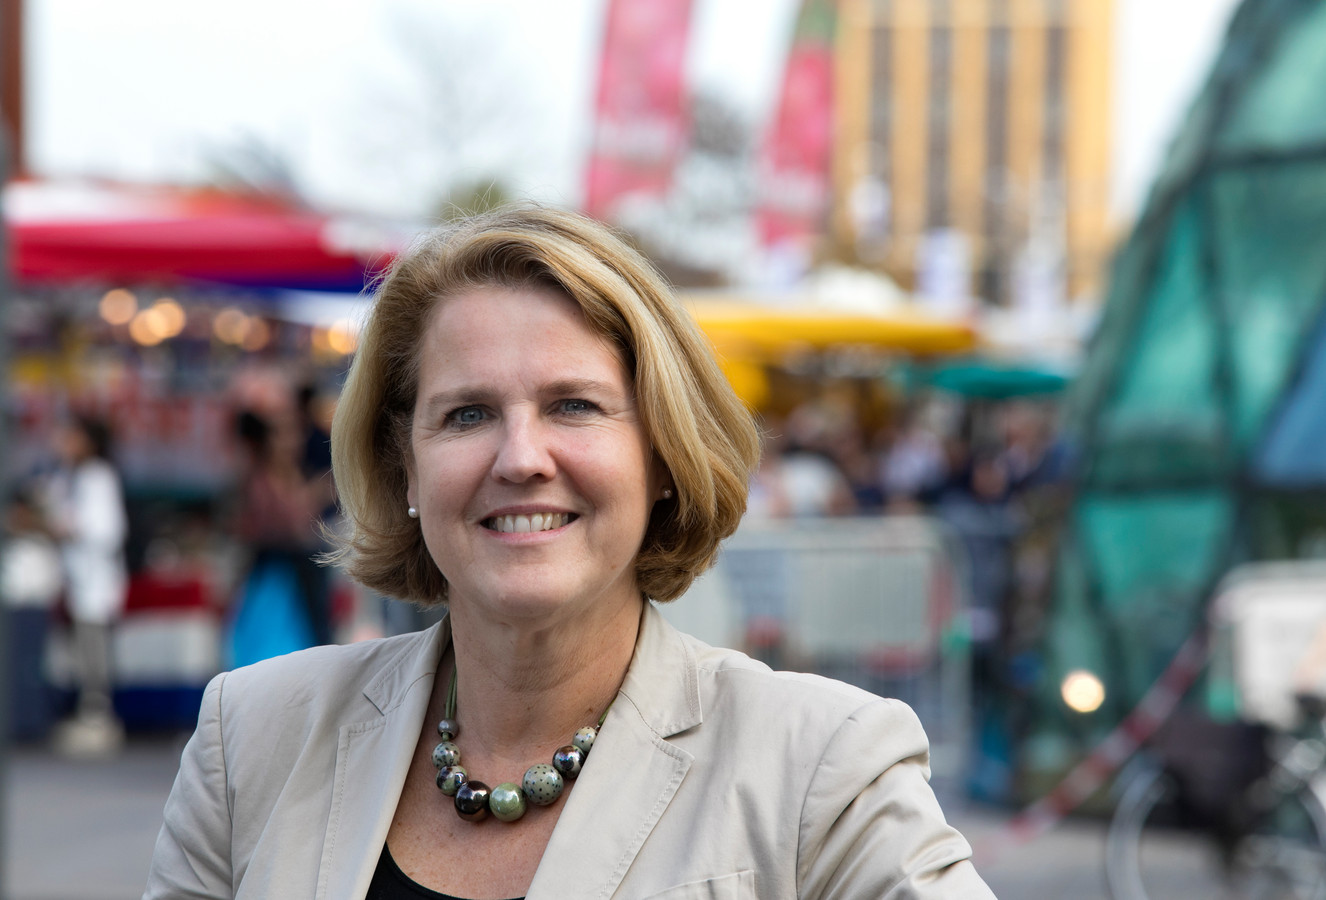 De Eindhovense wethouder Monique List.